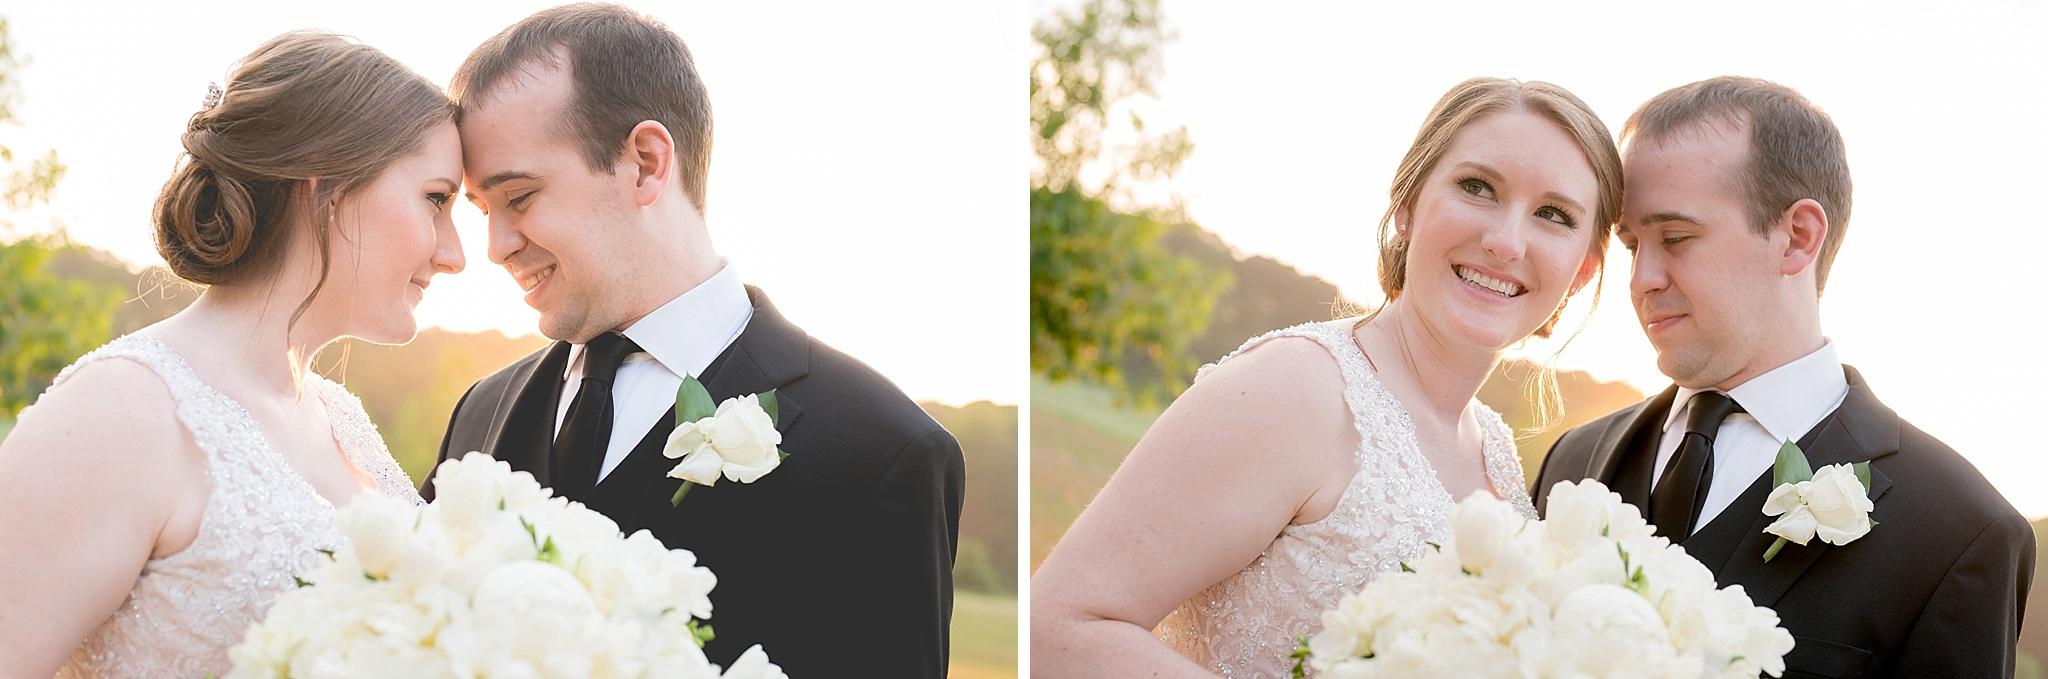 Pavilion-Carriage-Farms-Wedding-Photographer-224.jpg